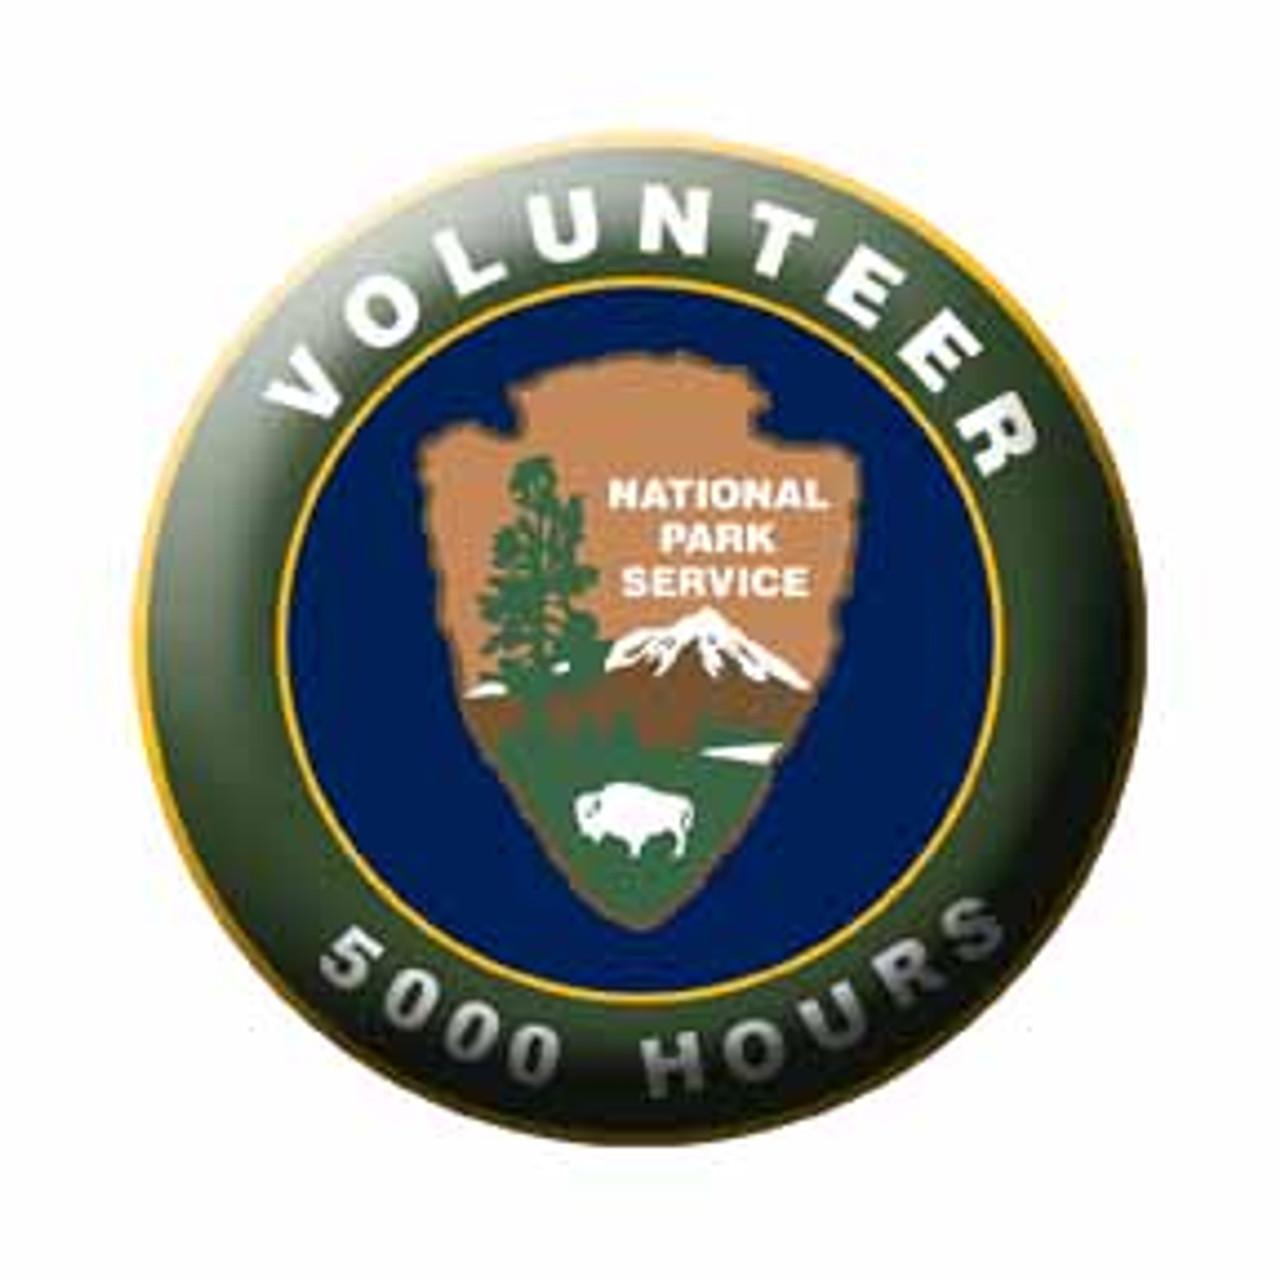 National Park Service Volunteer Hour Pins (4500 hours)